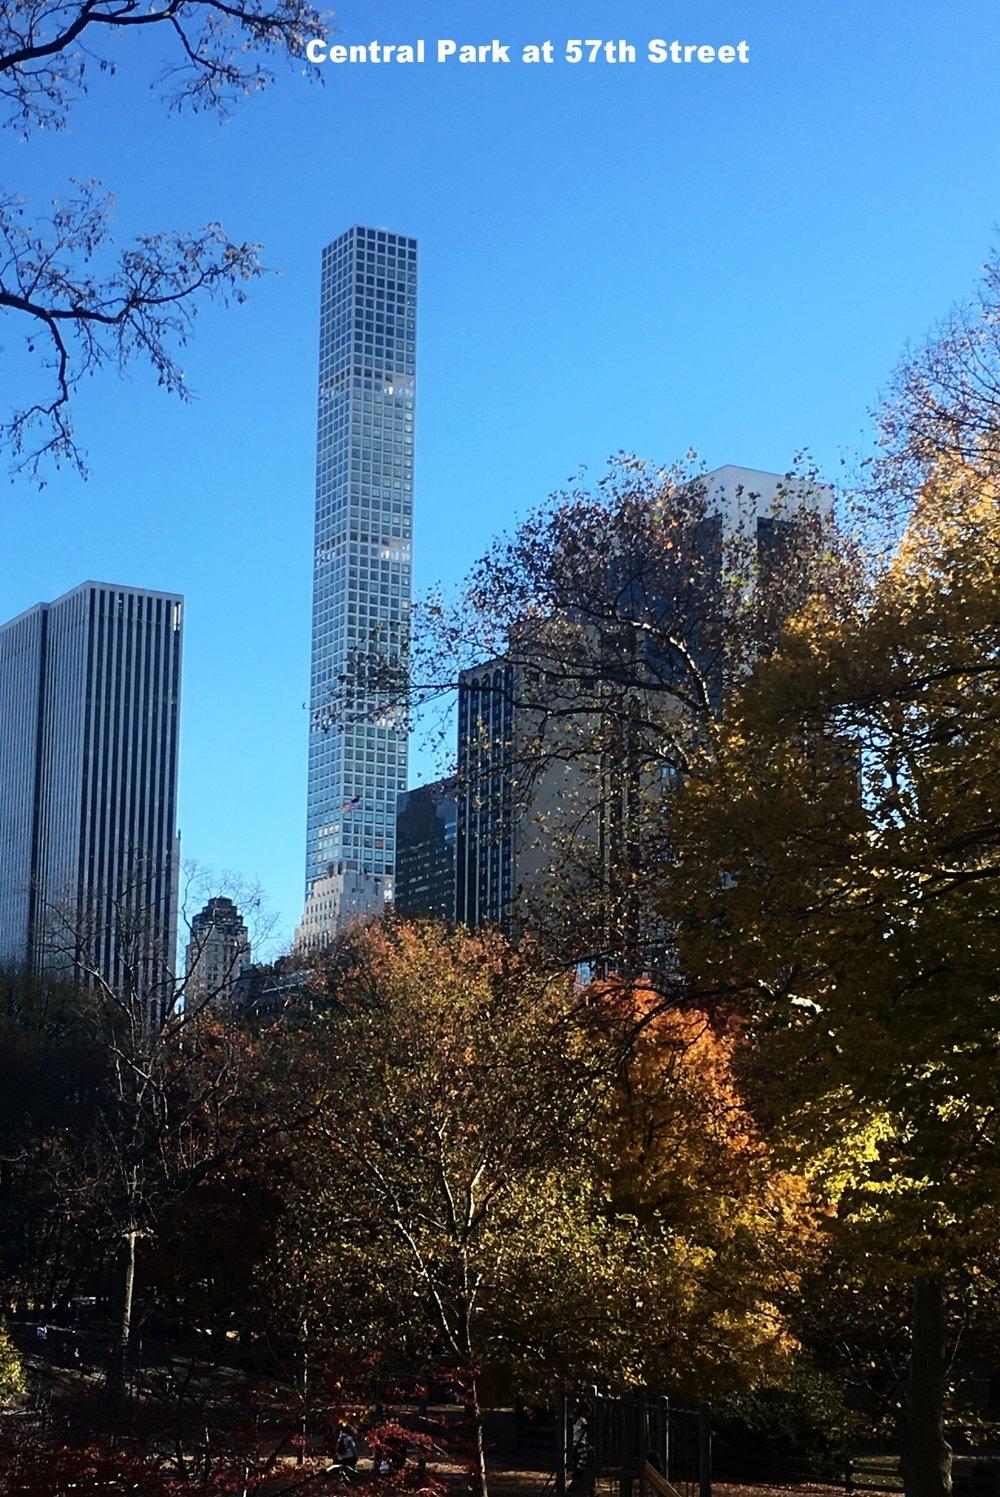 Central park 57th Street